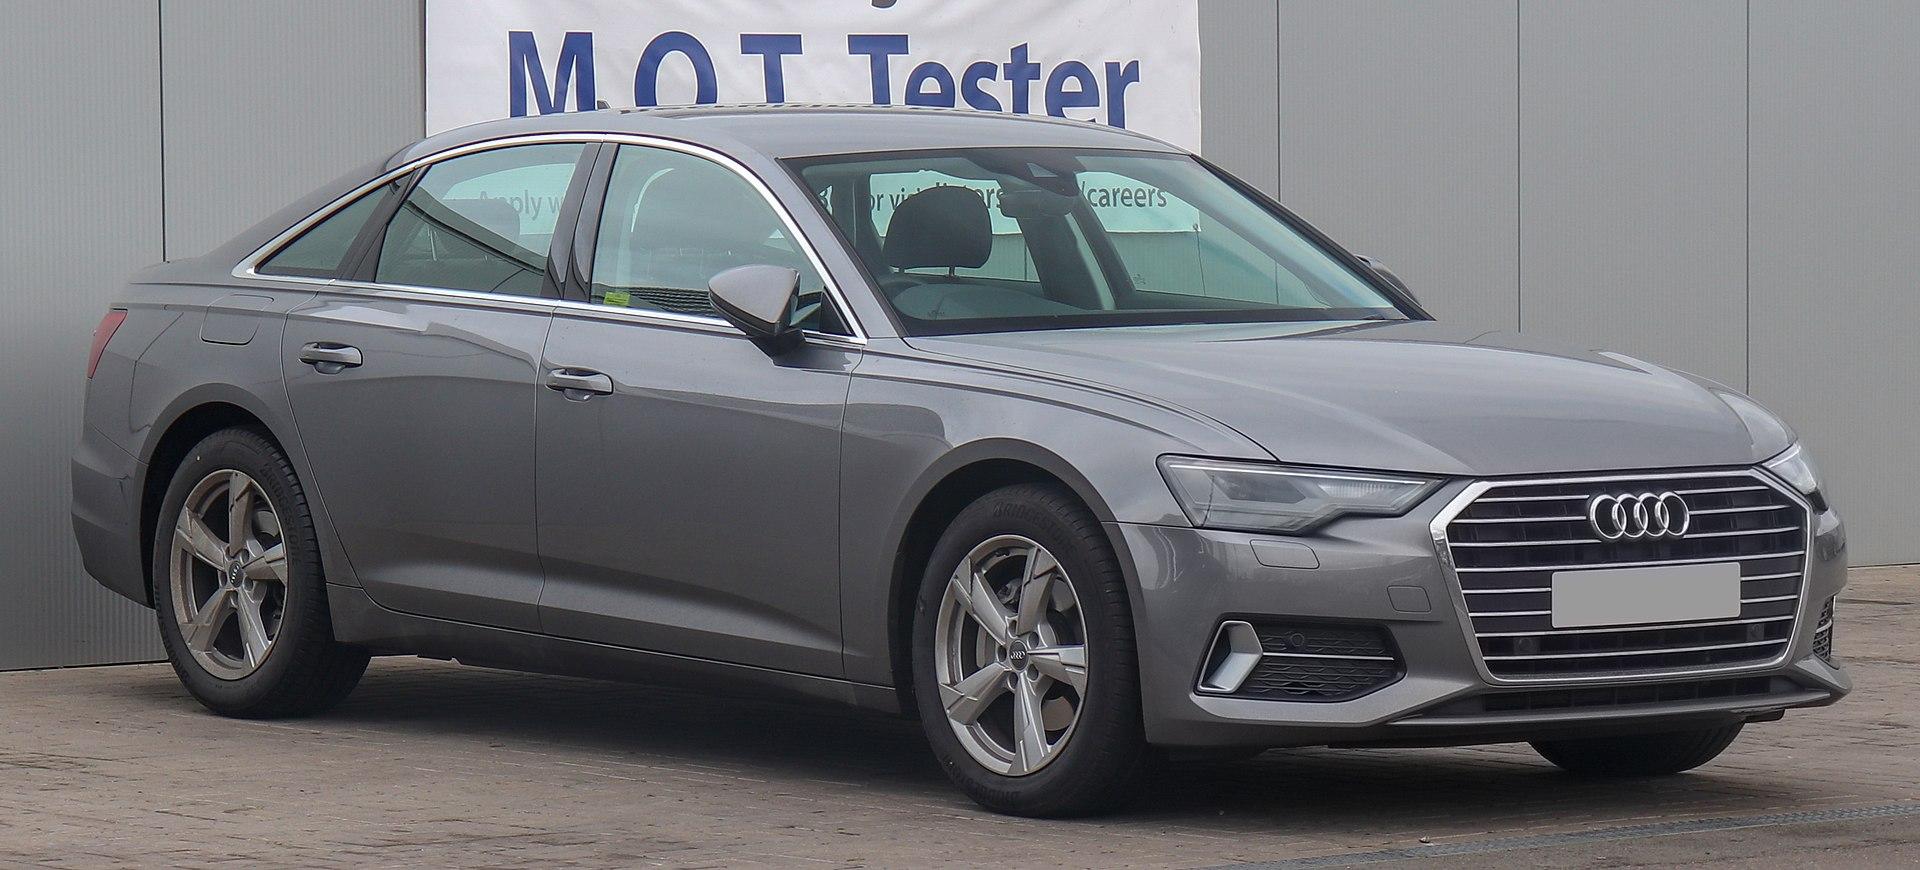 Audi A6 - 53,3%